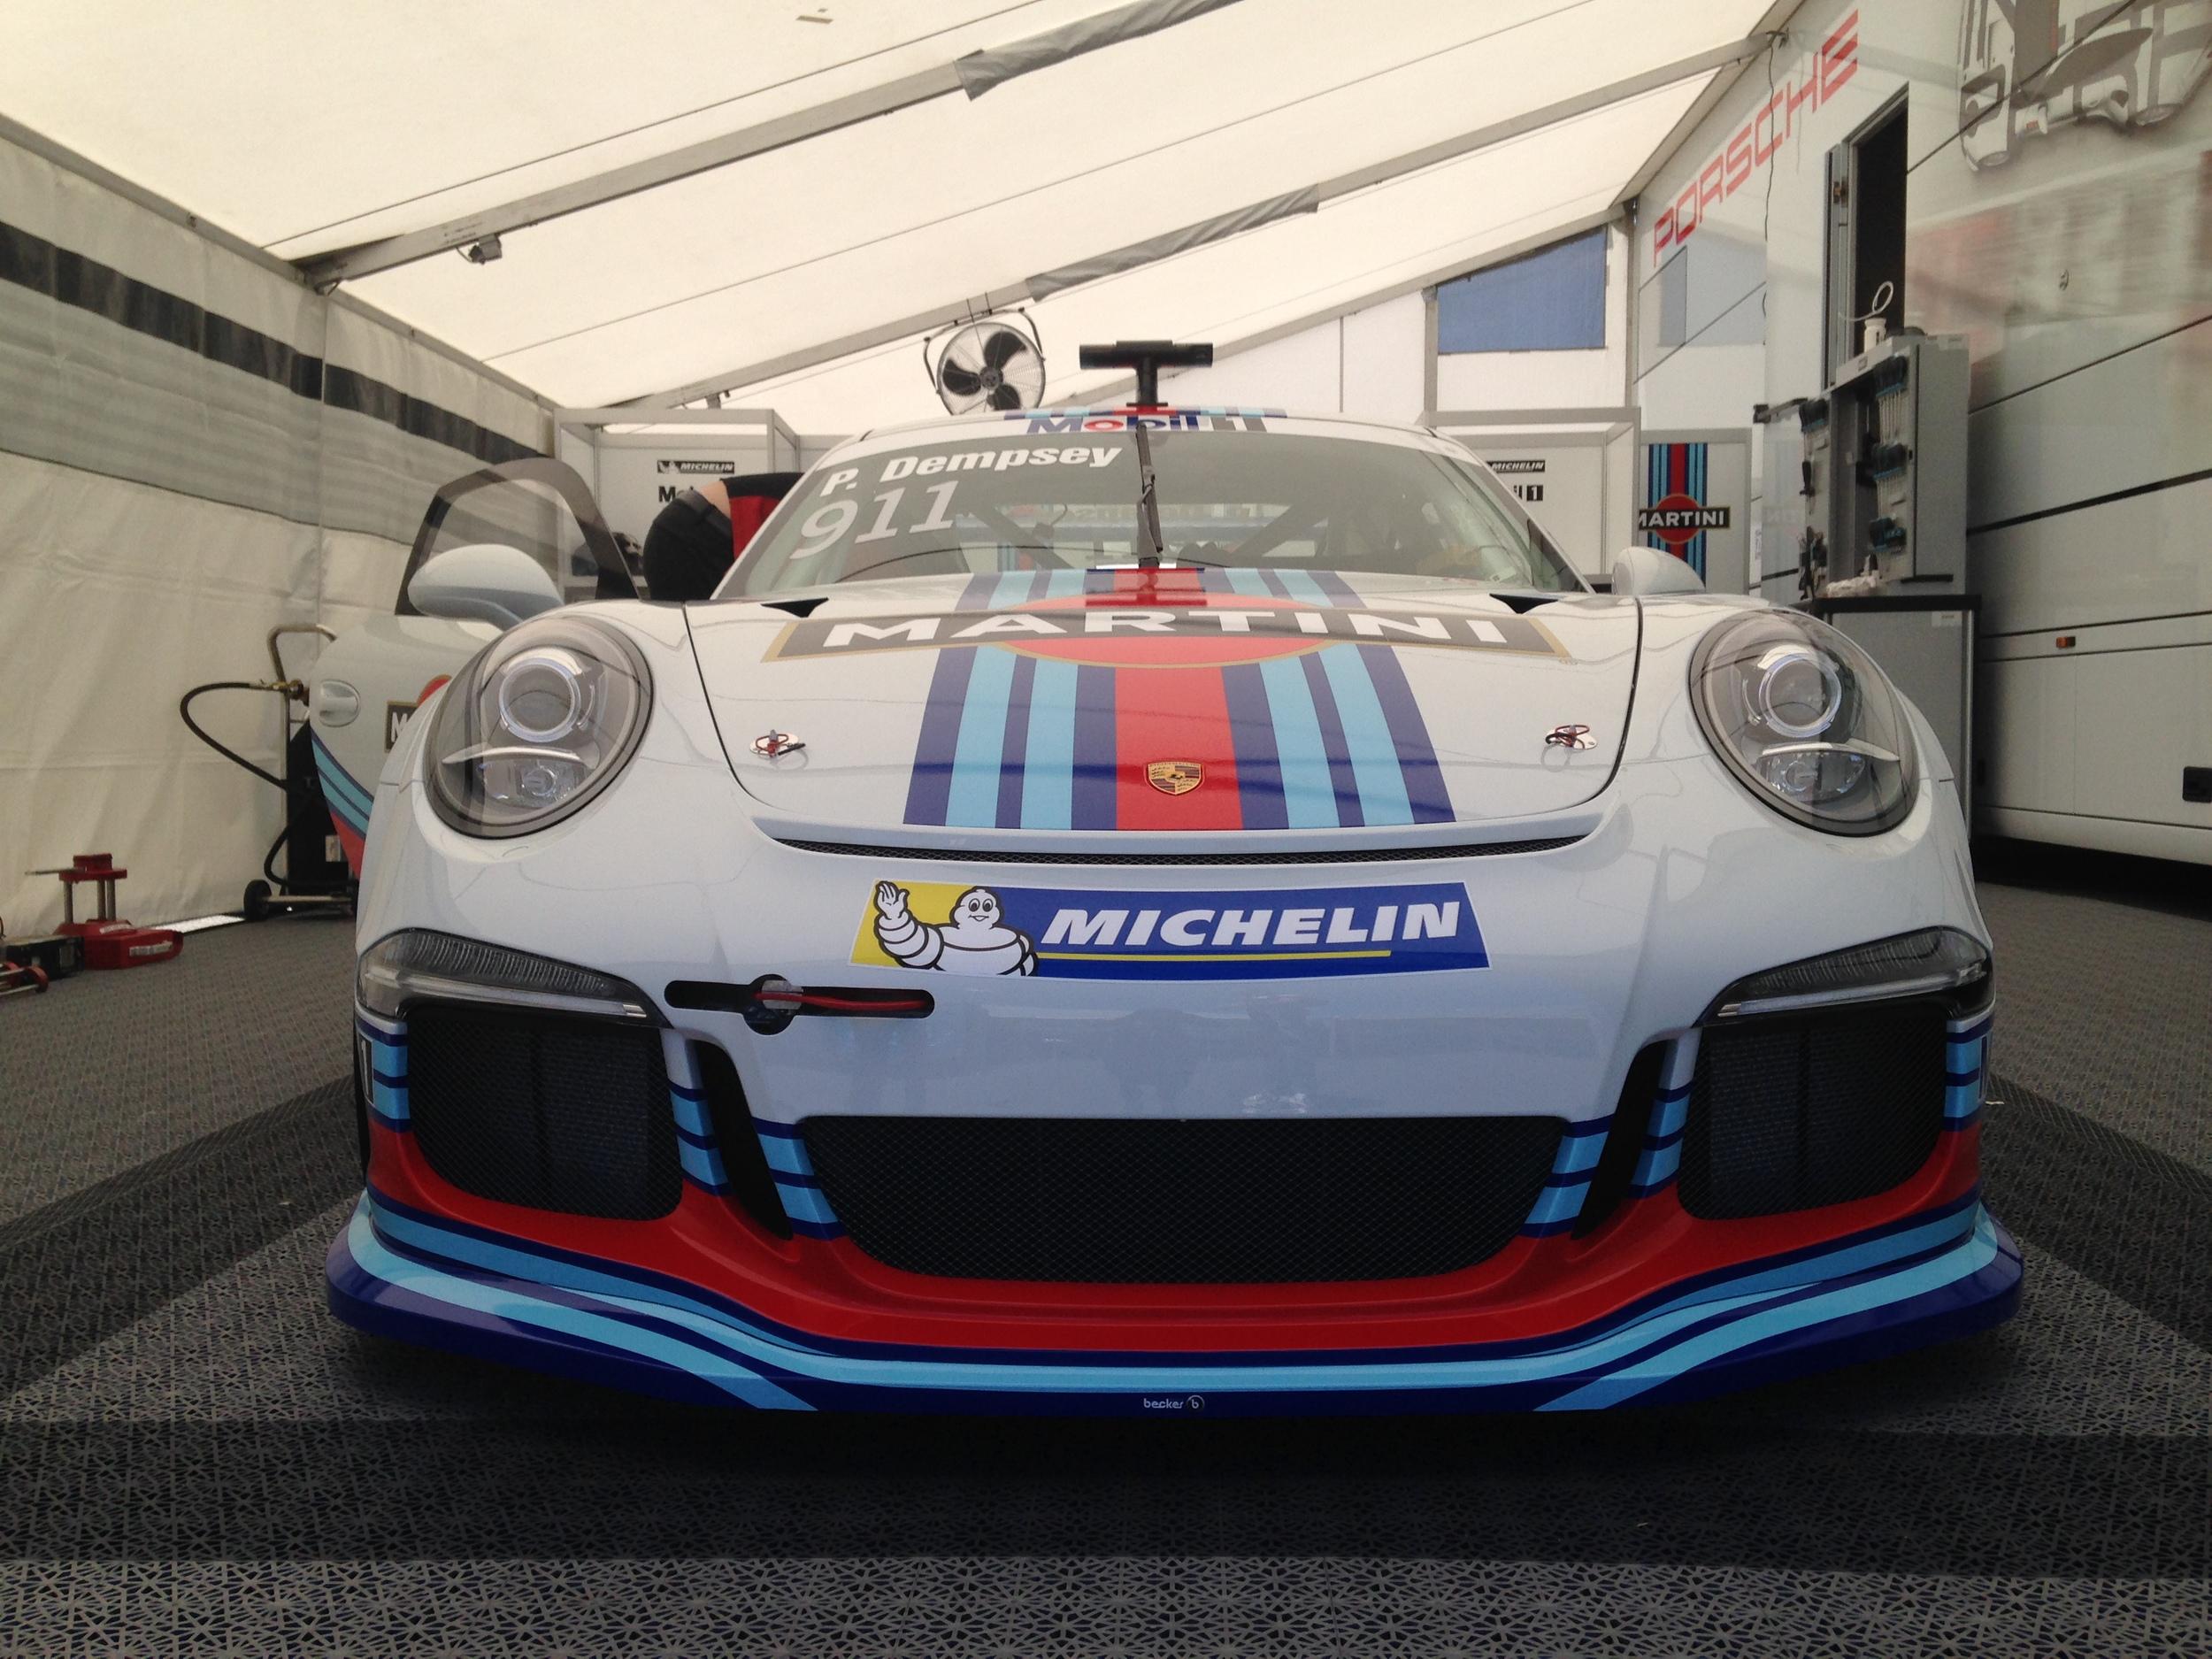 Patrick Dempsey's Martini-liveried Porsche